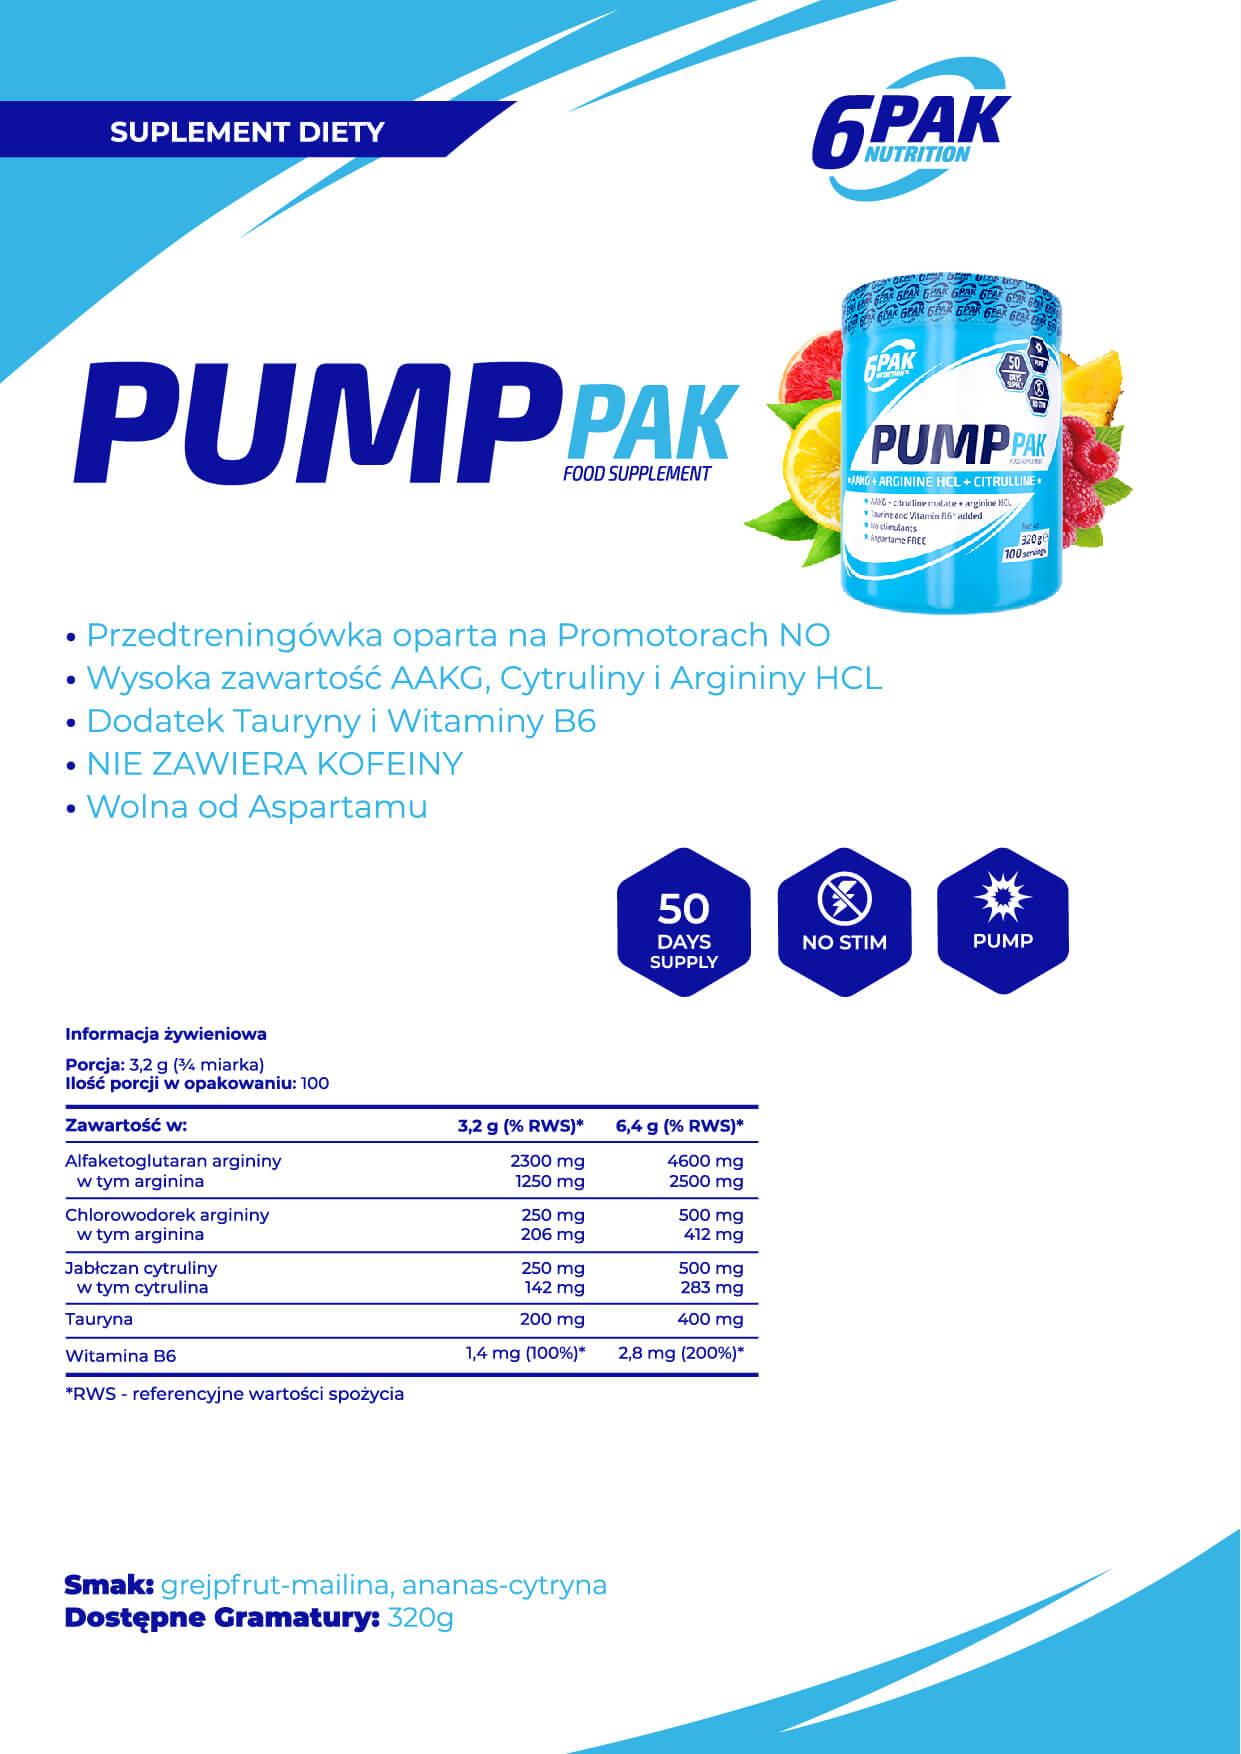 6PAK Nutrition Pump PAK Baner - 320g